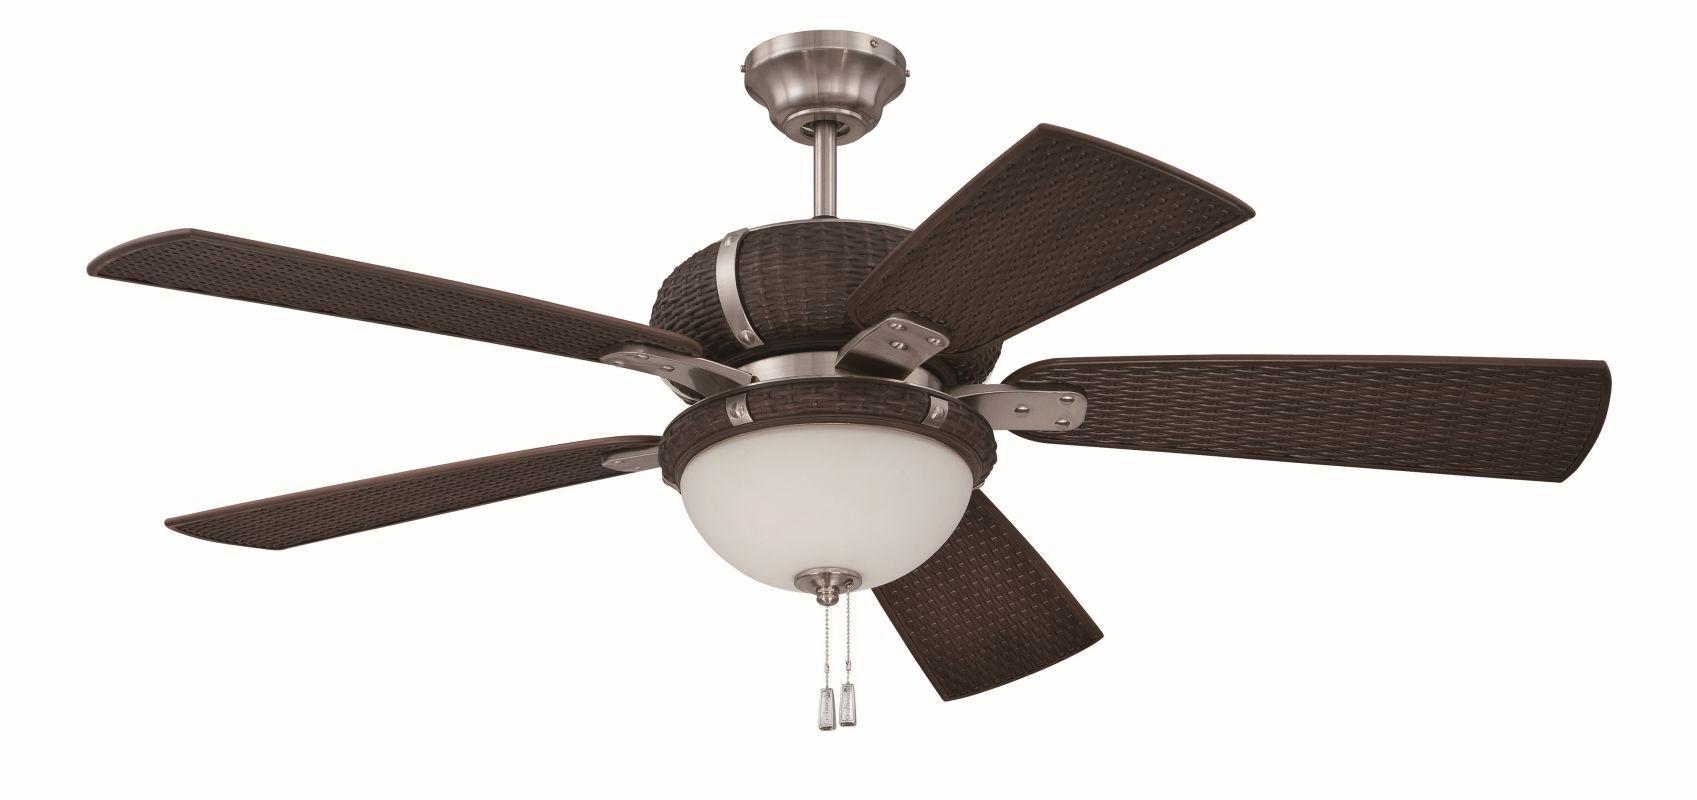 Craftmade La Playa 5 Blade Outdoor Ceiling Fan Blades And Light Kit Stainless Steel Dark Wicker Fans